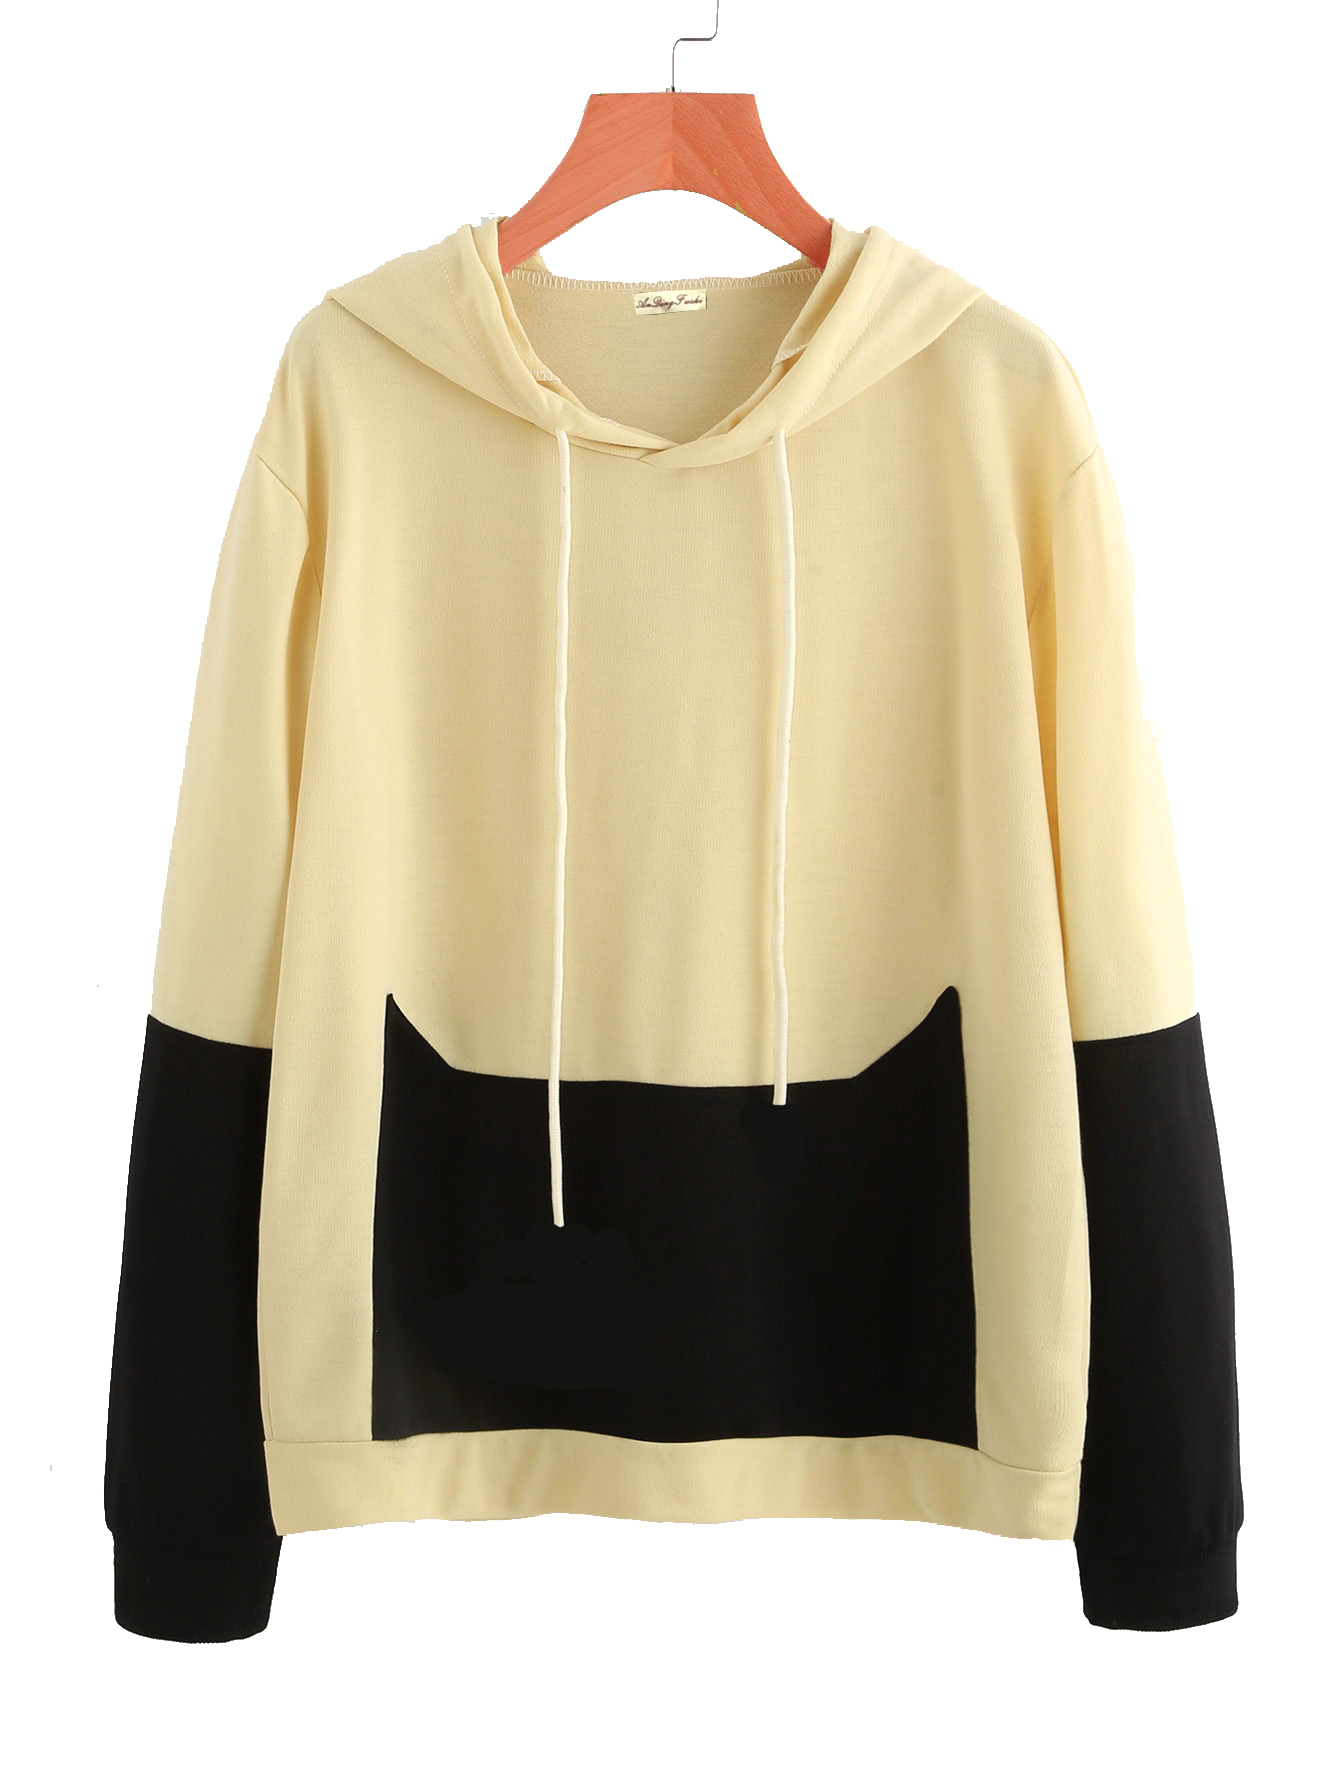 Cat Cute Patchwork Hoodies Sweatshirts 2019 Women Casual Kawaii Harajuku New Sweat Punk For Girls Clothing European Tops Korean